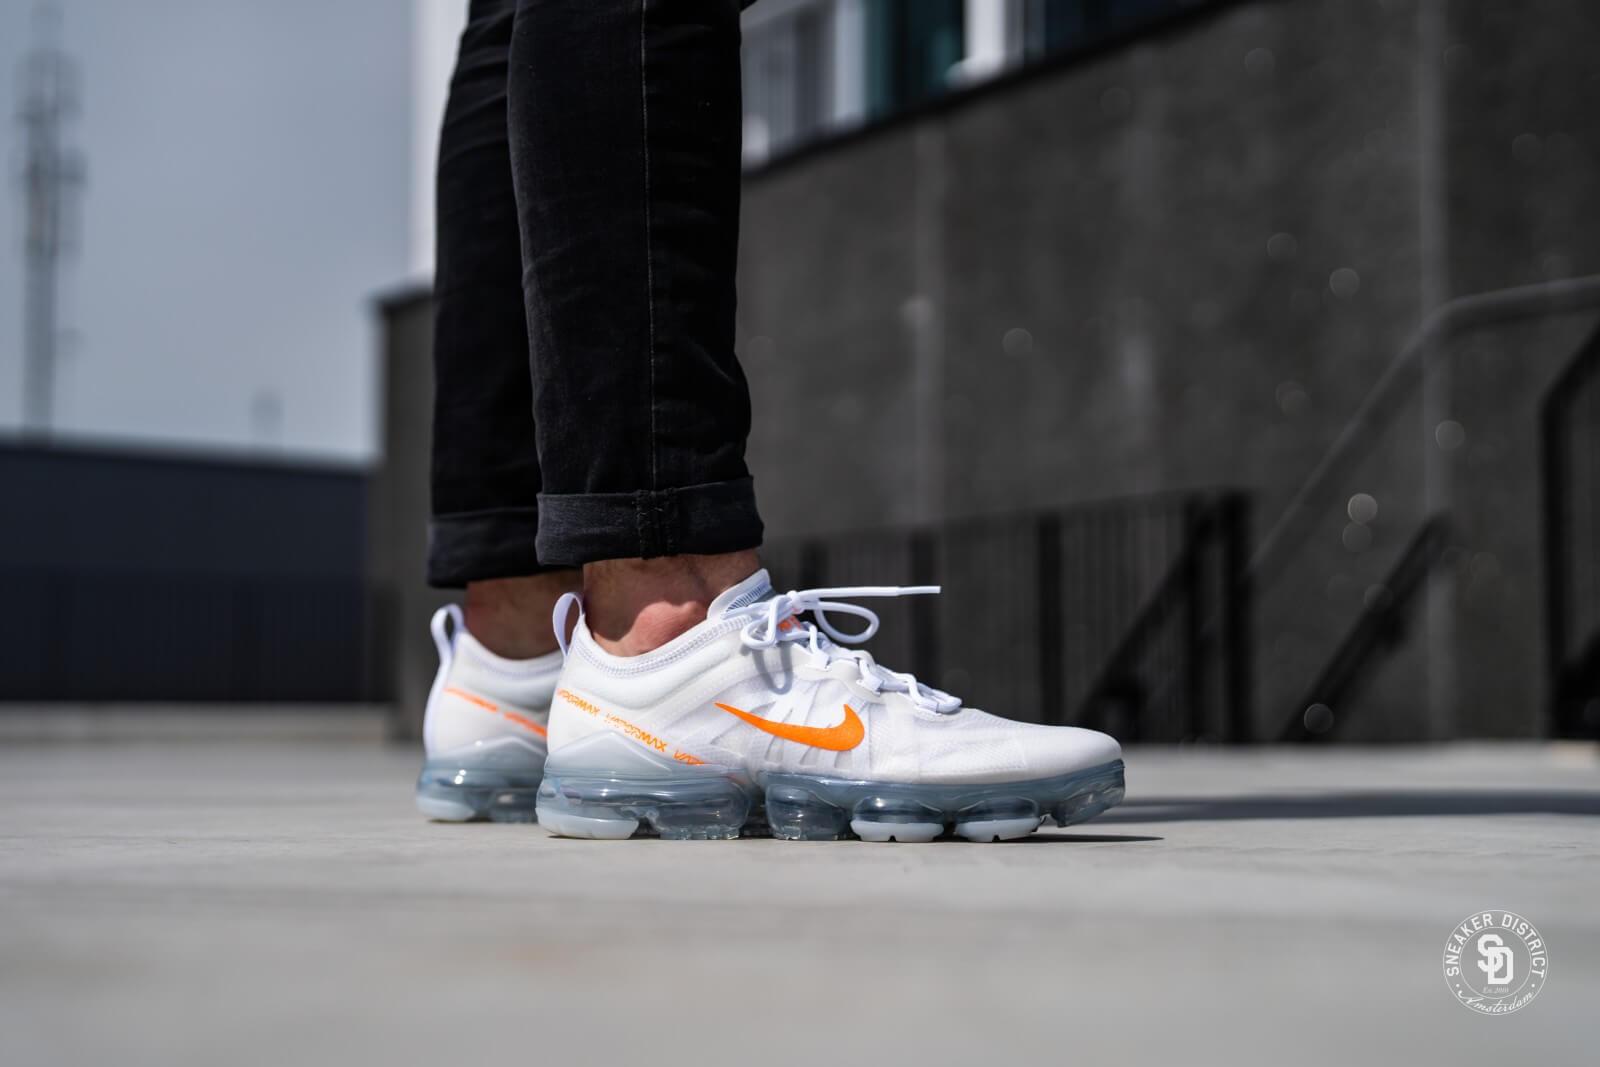 Nike Air Vapormax 2019 White/Total